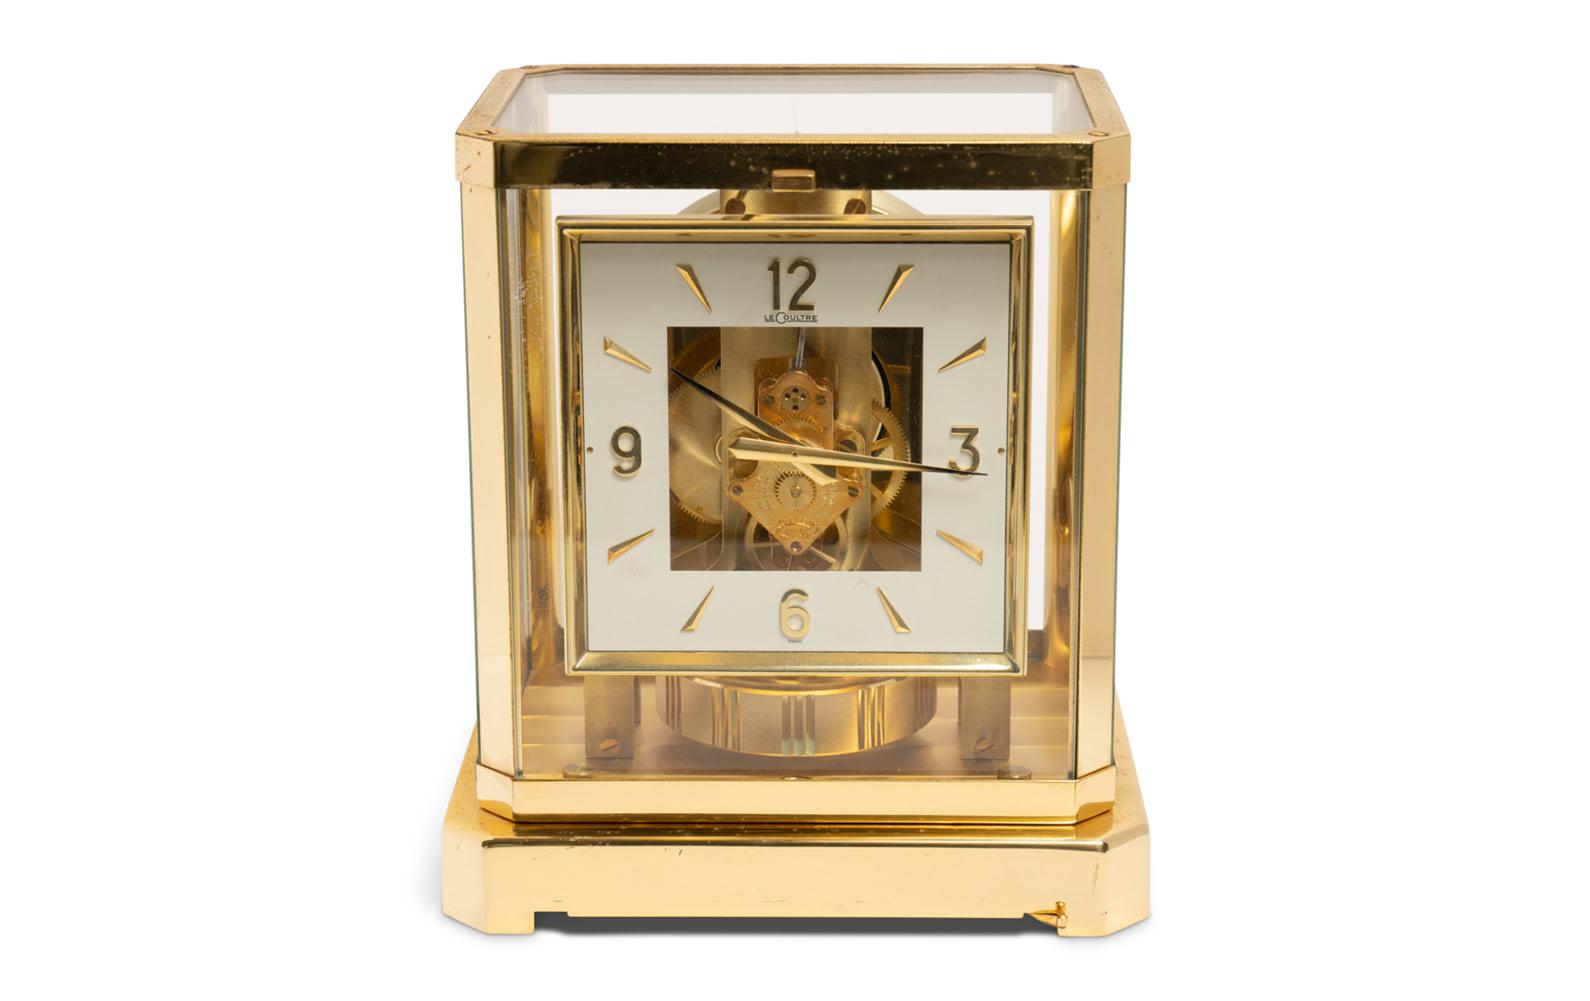 Prod/O21E - Phil Hill C 2021/C0186_Jaeger-LeCoultre Atmos Clock/C0186_Jaeger_LeCoultre_Atmos_Clock_1_vsi1jv